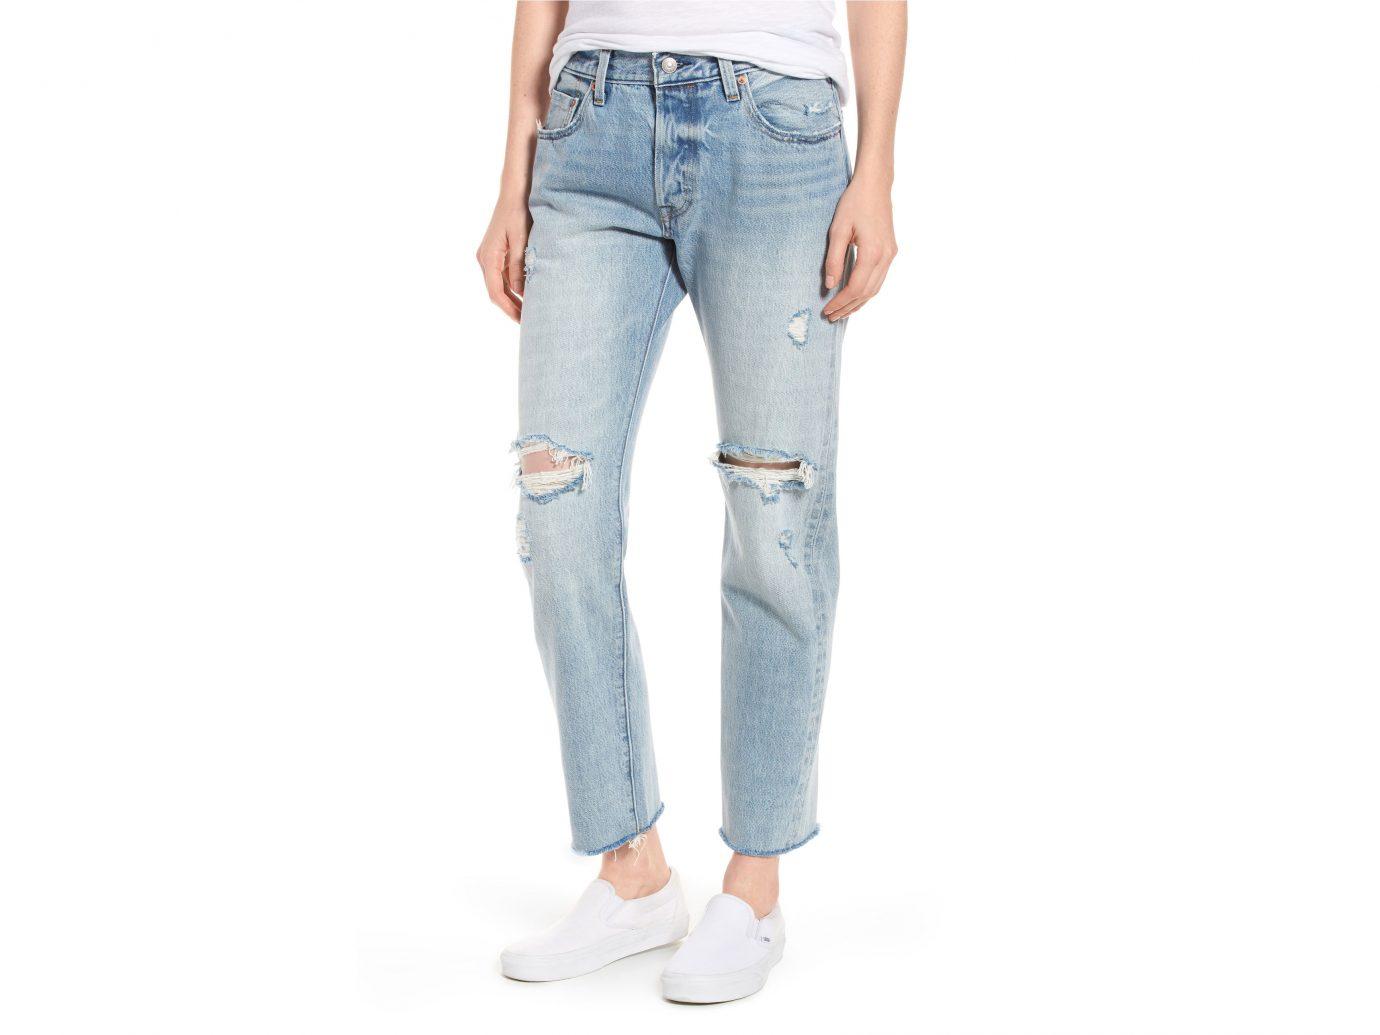 Levi's Ripped High Waist Crop Jeans